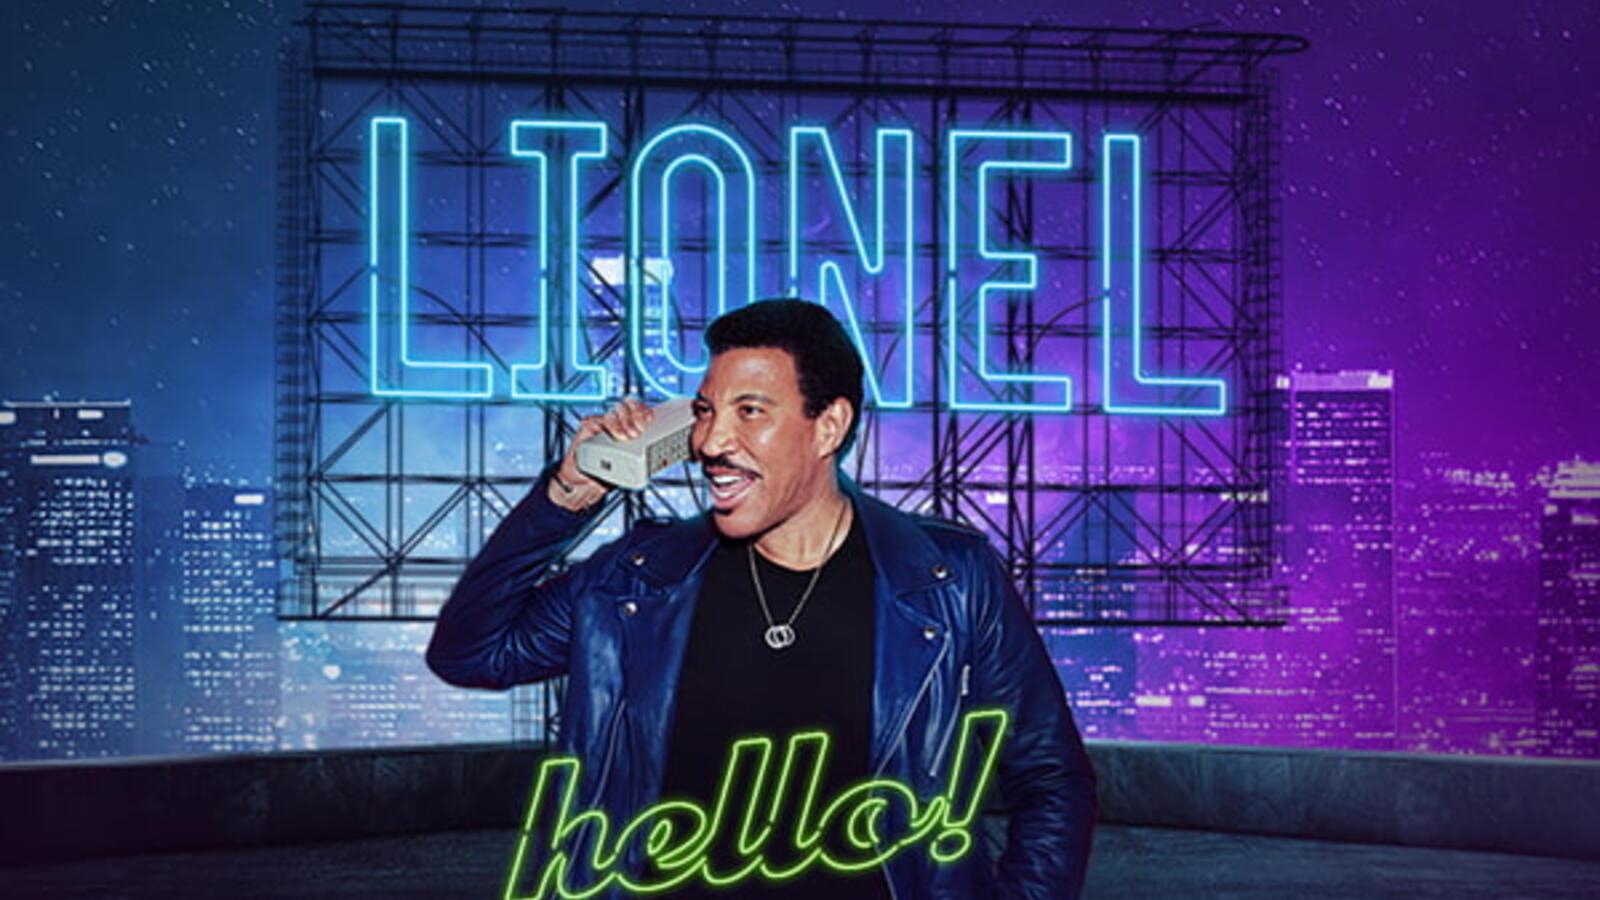 Dubai Jazz Festival: Lionel Richie on Feb 27th at Media City Amphitheatre